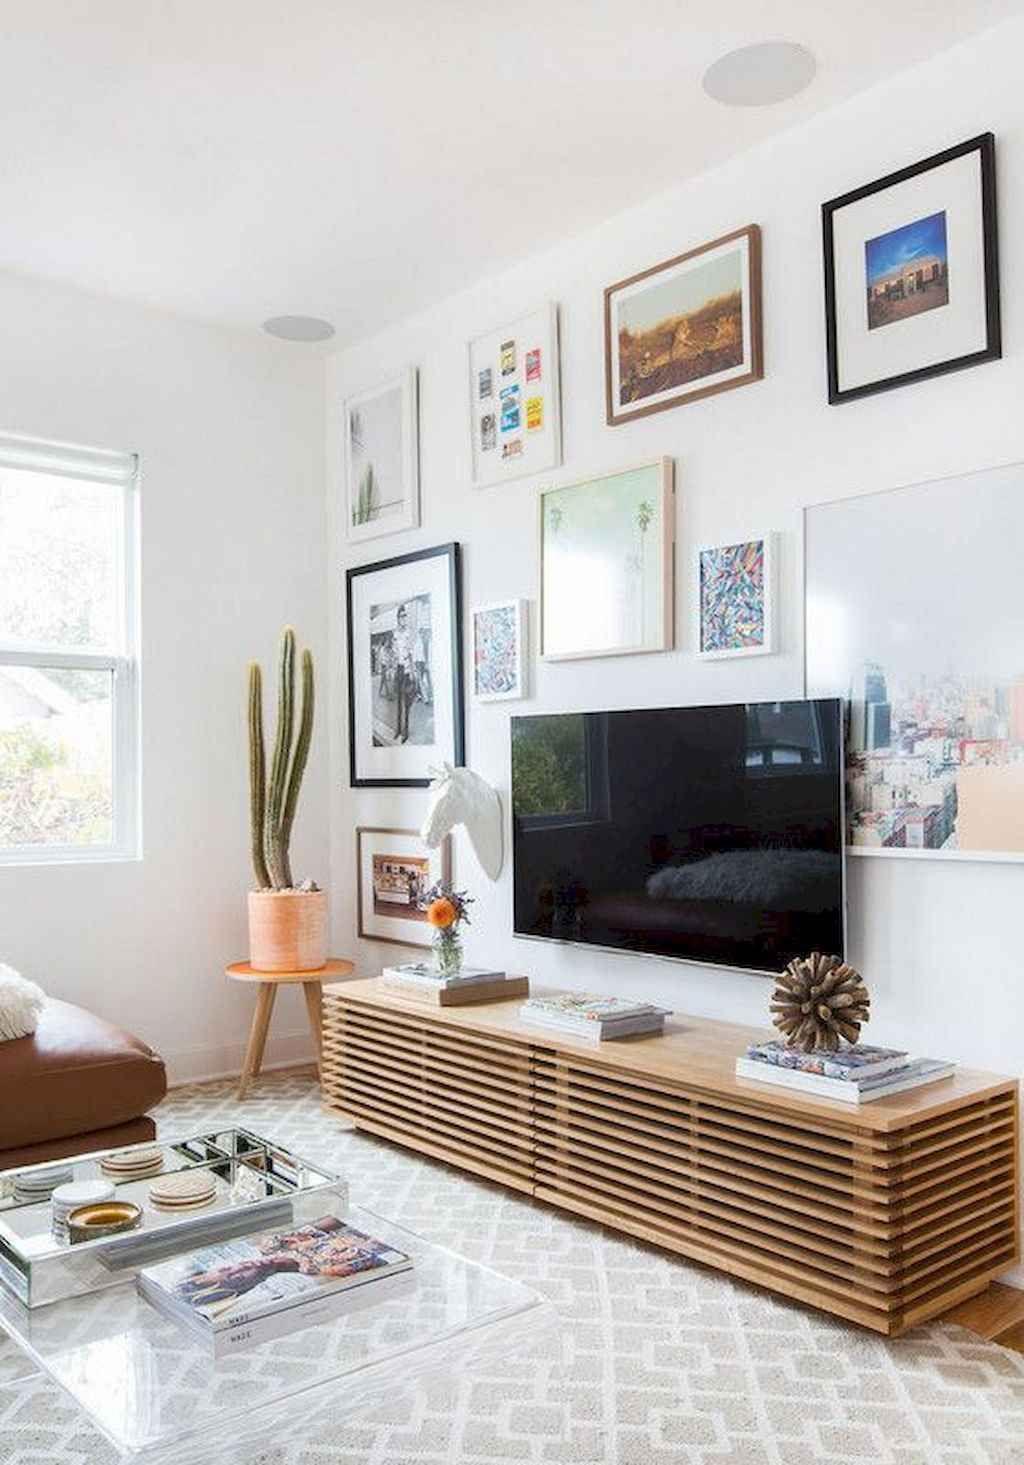 70 Modern Small Living Room Design Ideas In 2020 Living Room Tv Wall Living Room Tv Small Modern Living Room